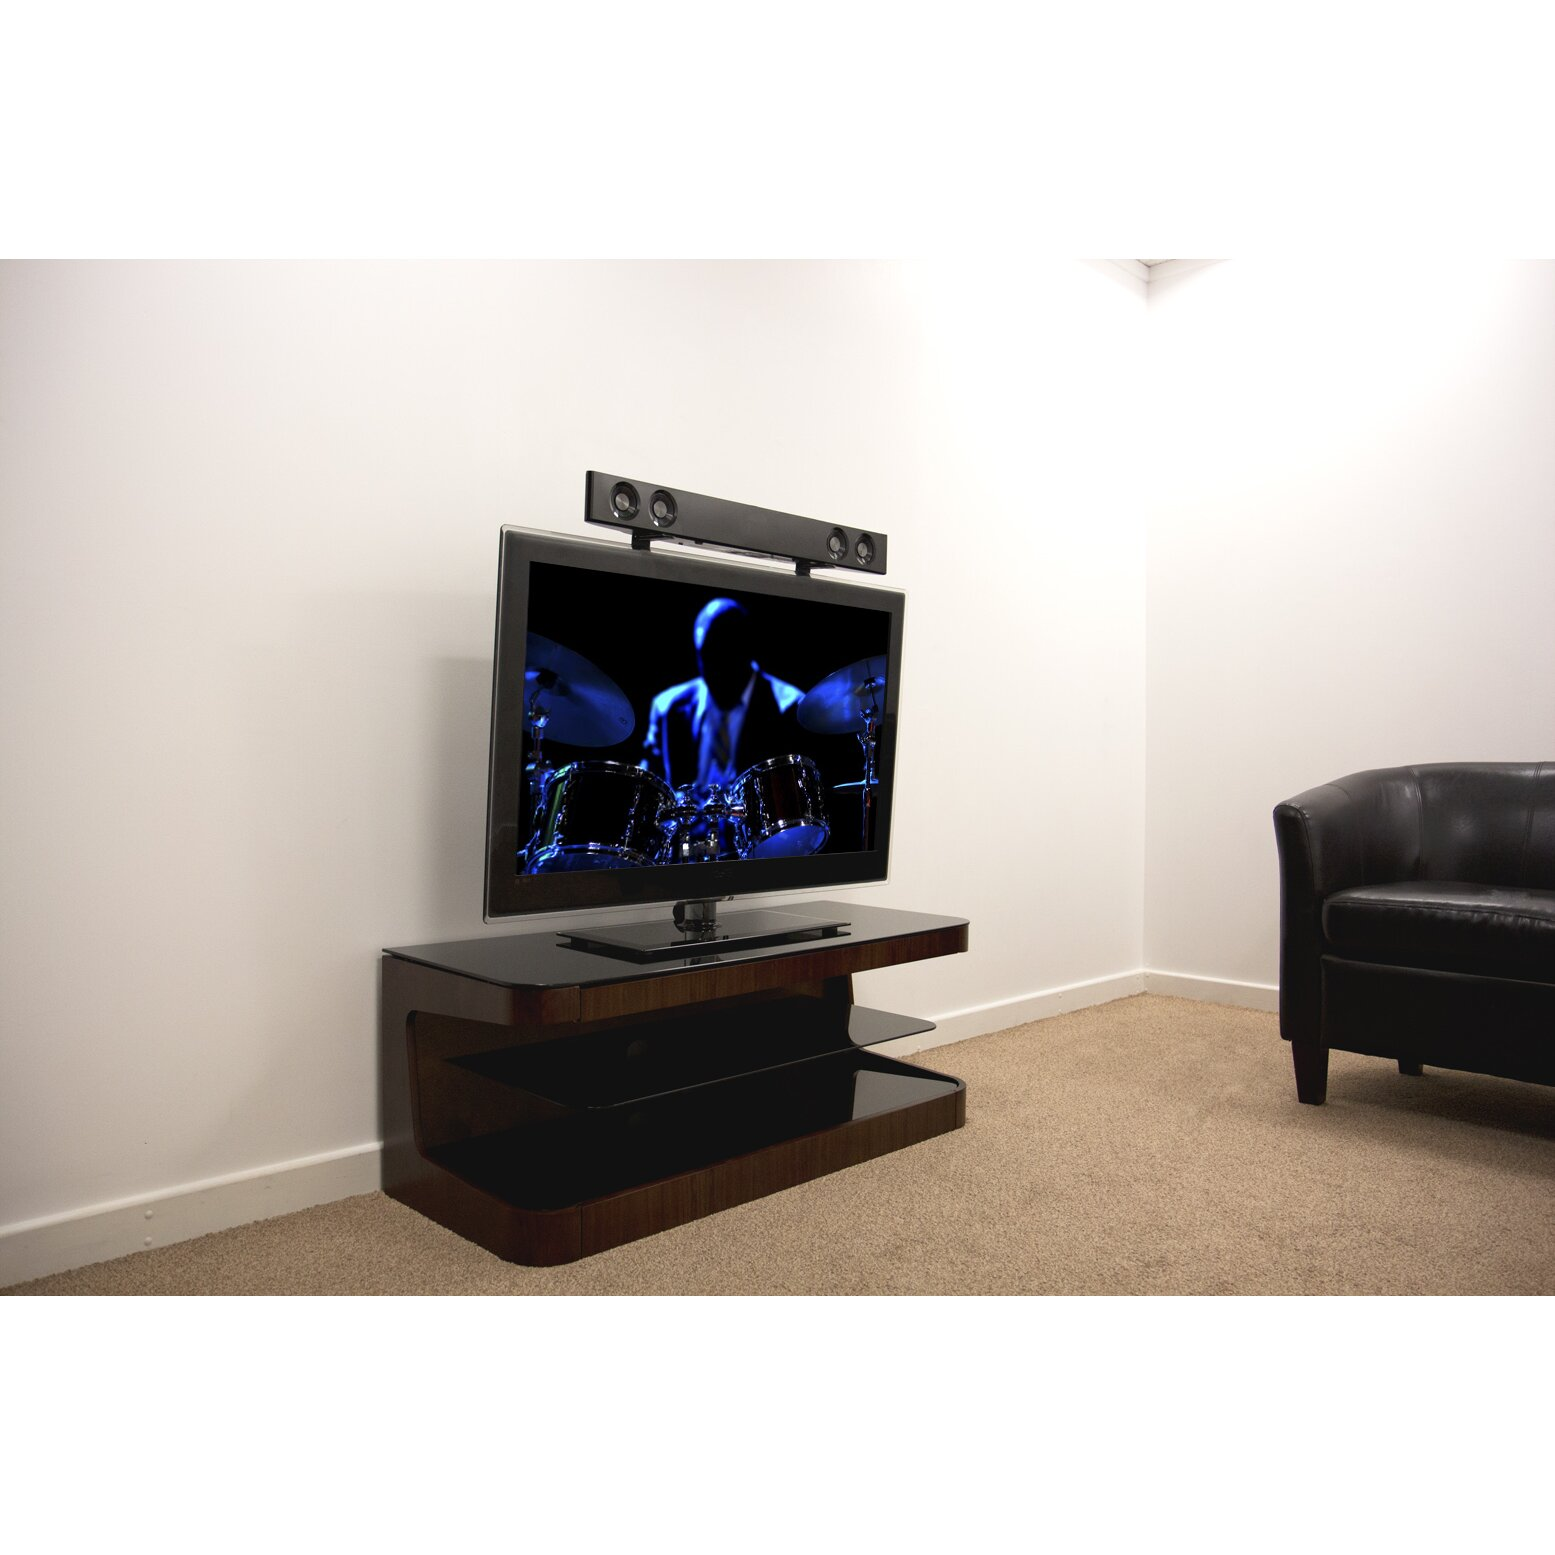 Avf Universal Soundbar Wall Mount For Flat Panel Screens Reviews Wayfair